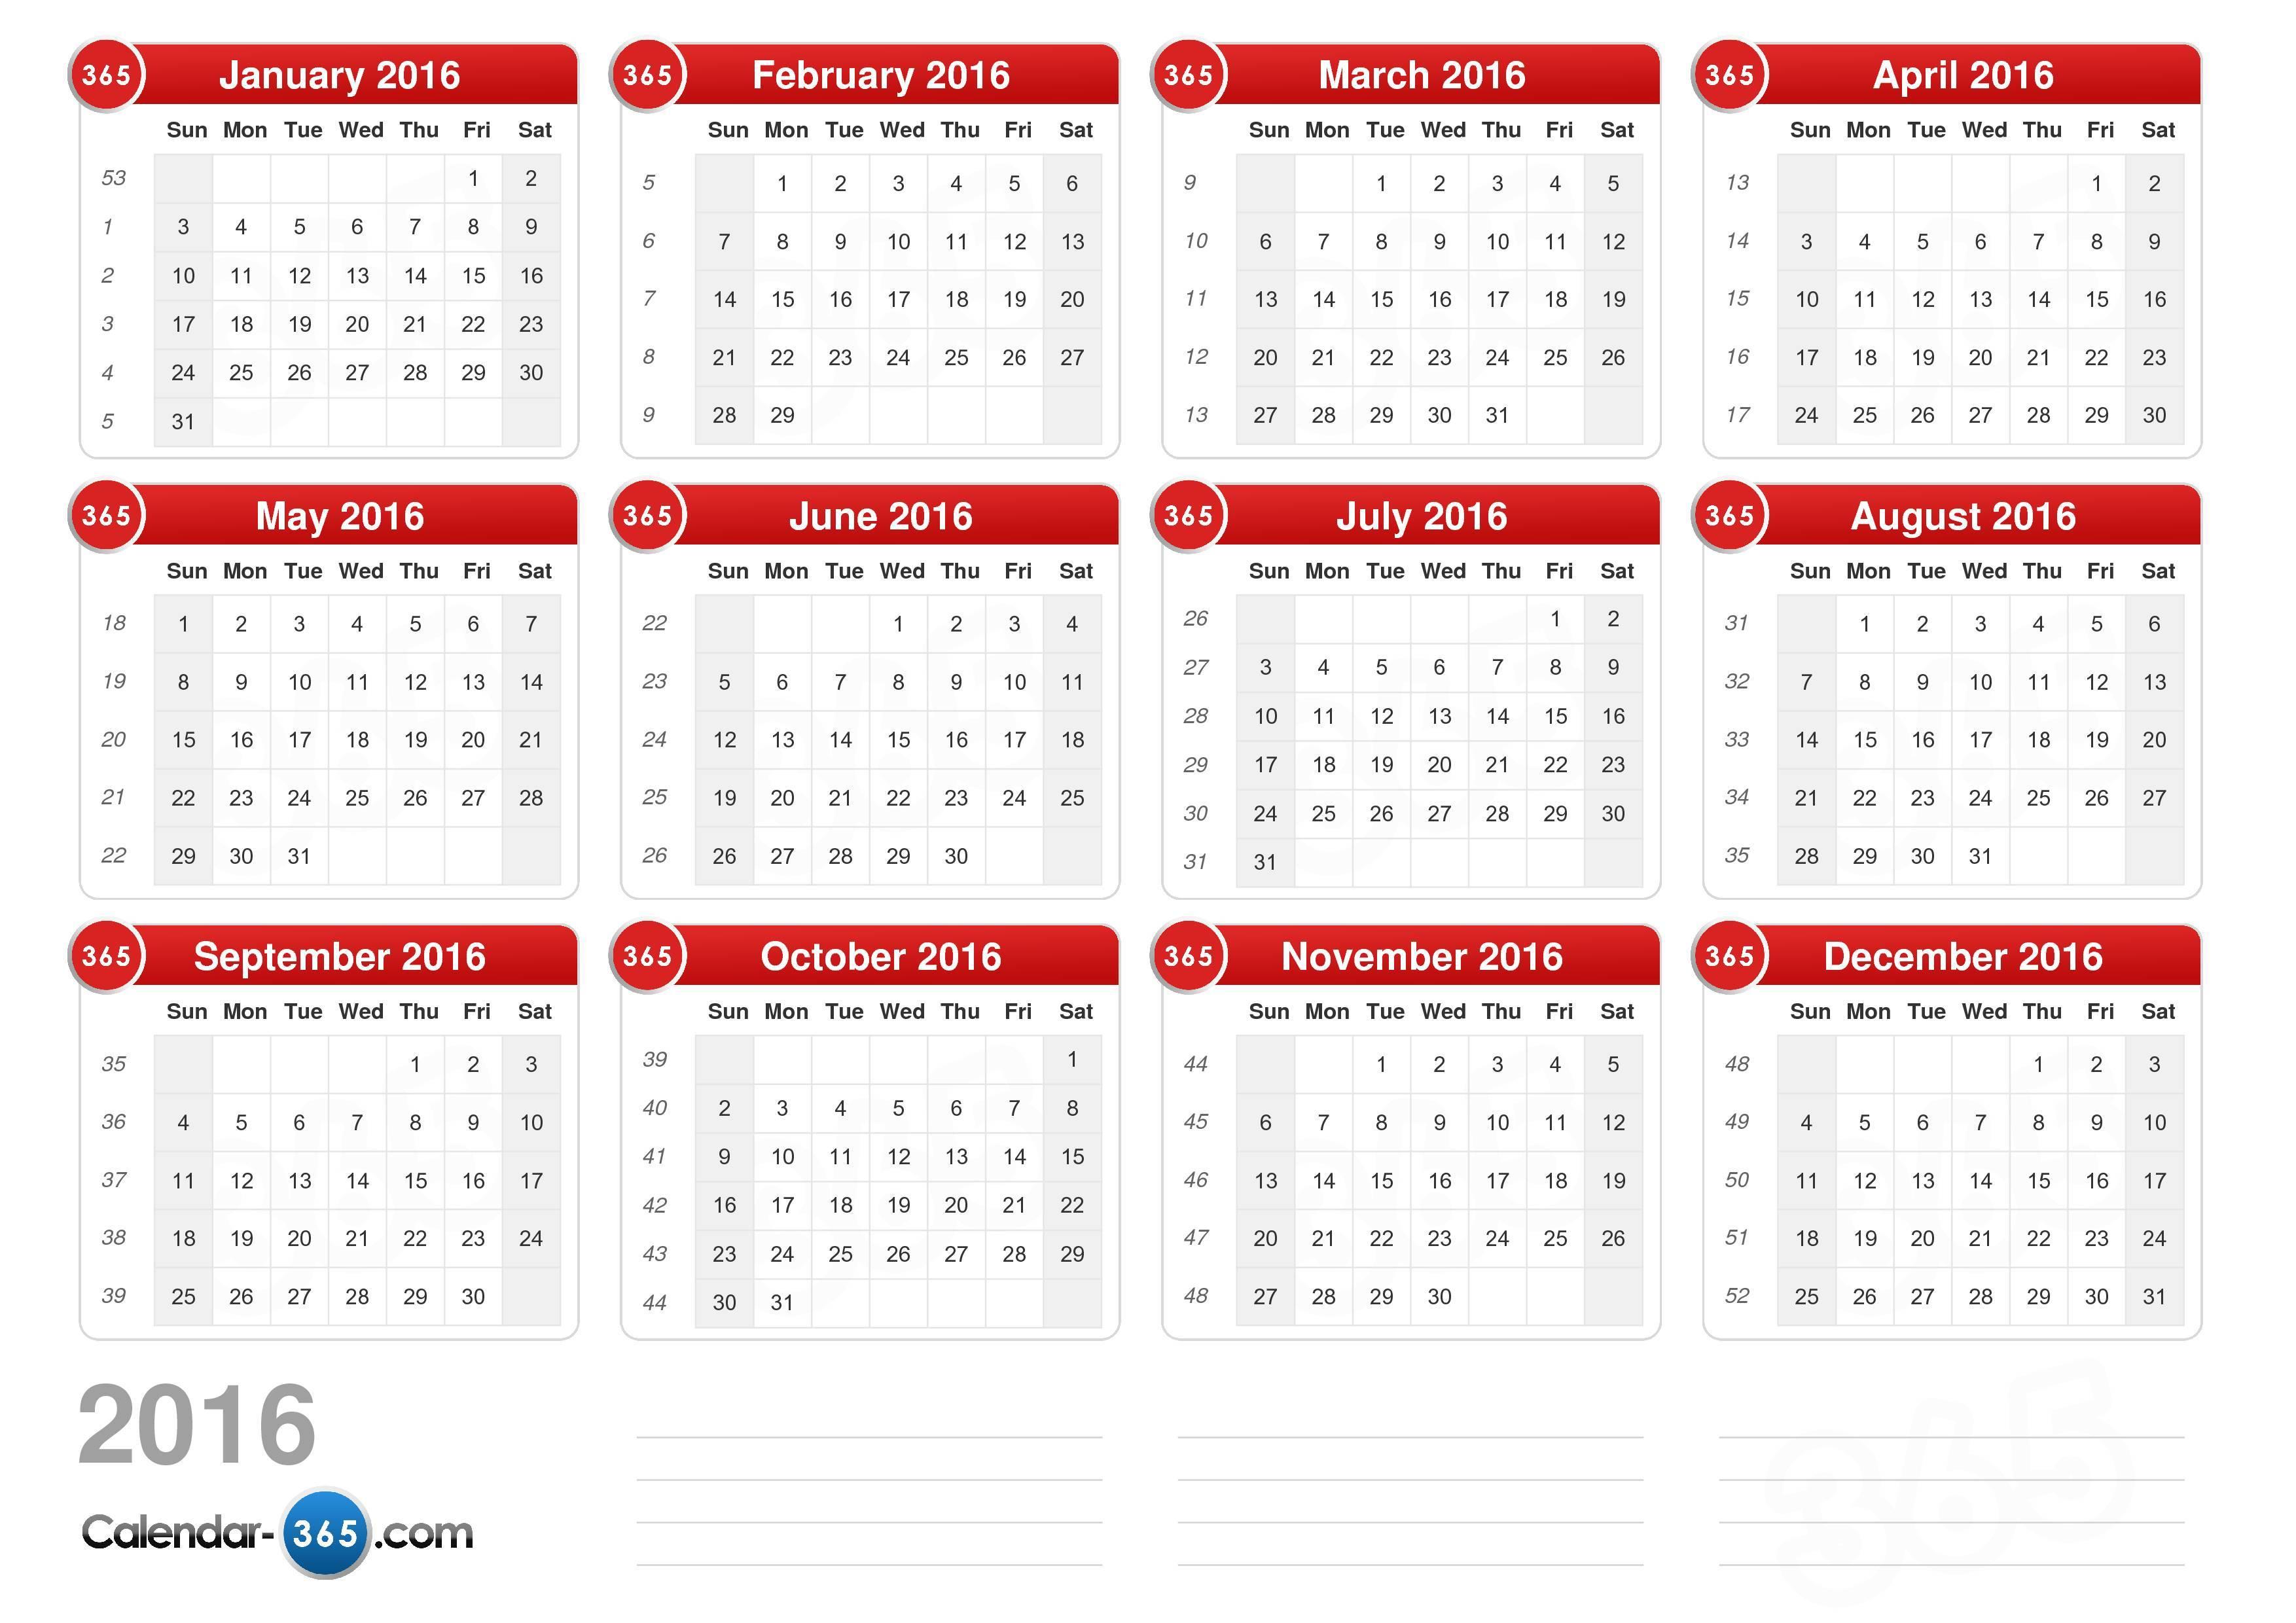 1961 April Calendar Year Year 1961 Calendar United States Time And Date 2016 Calendar